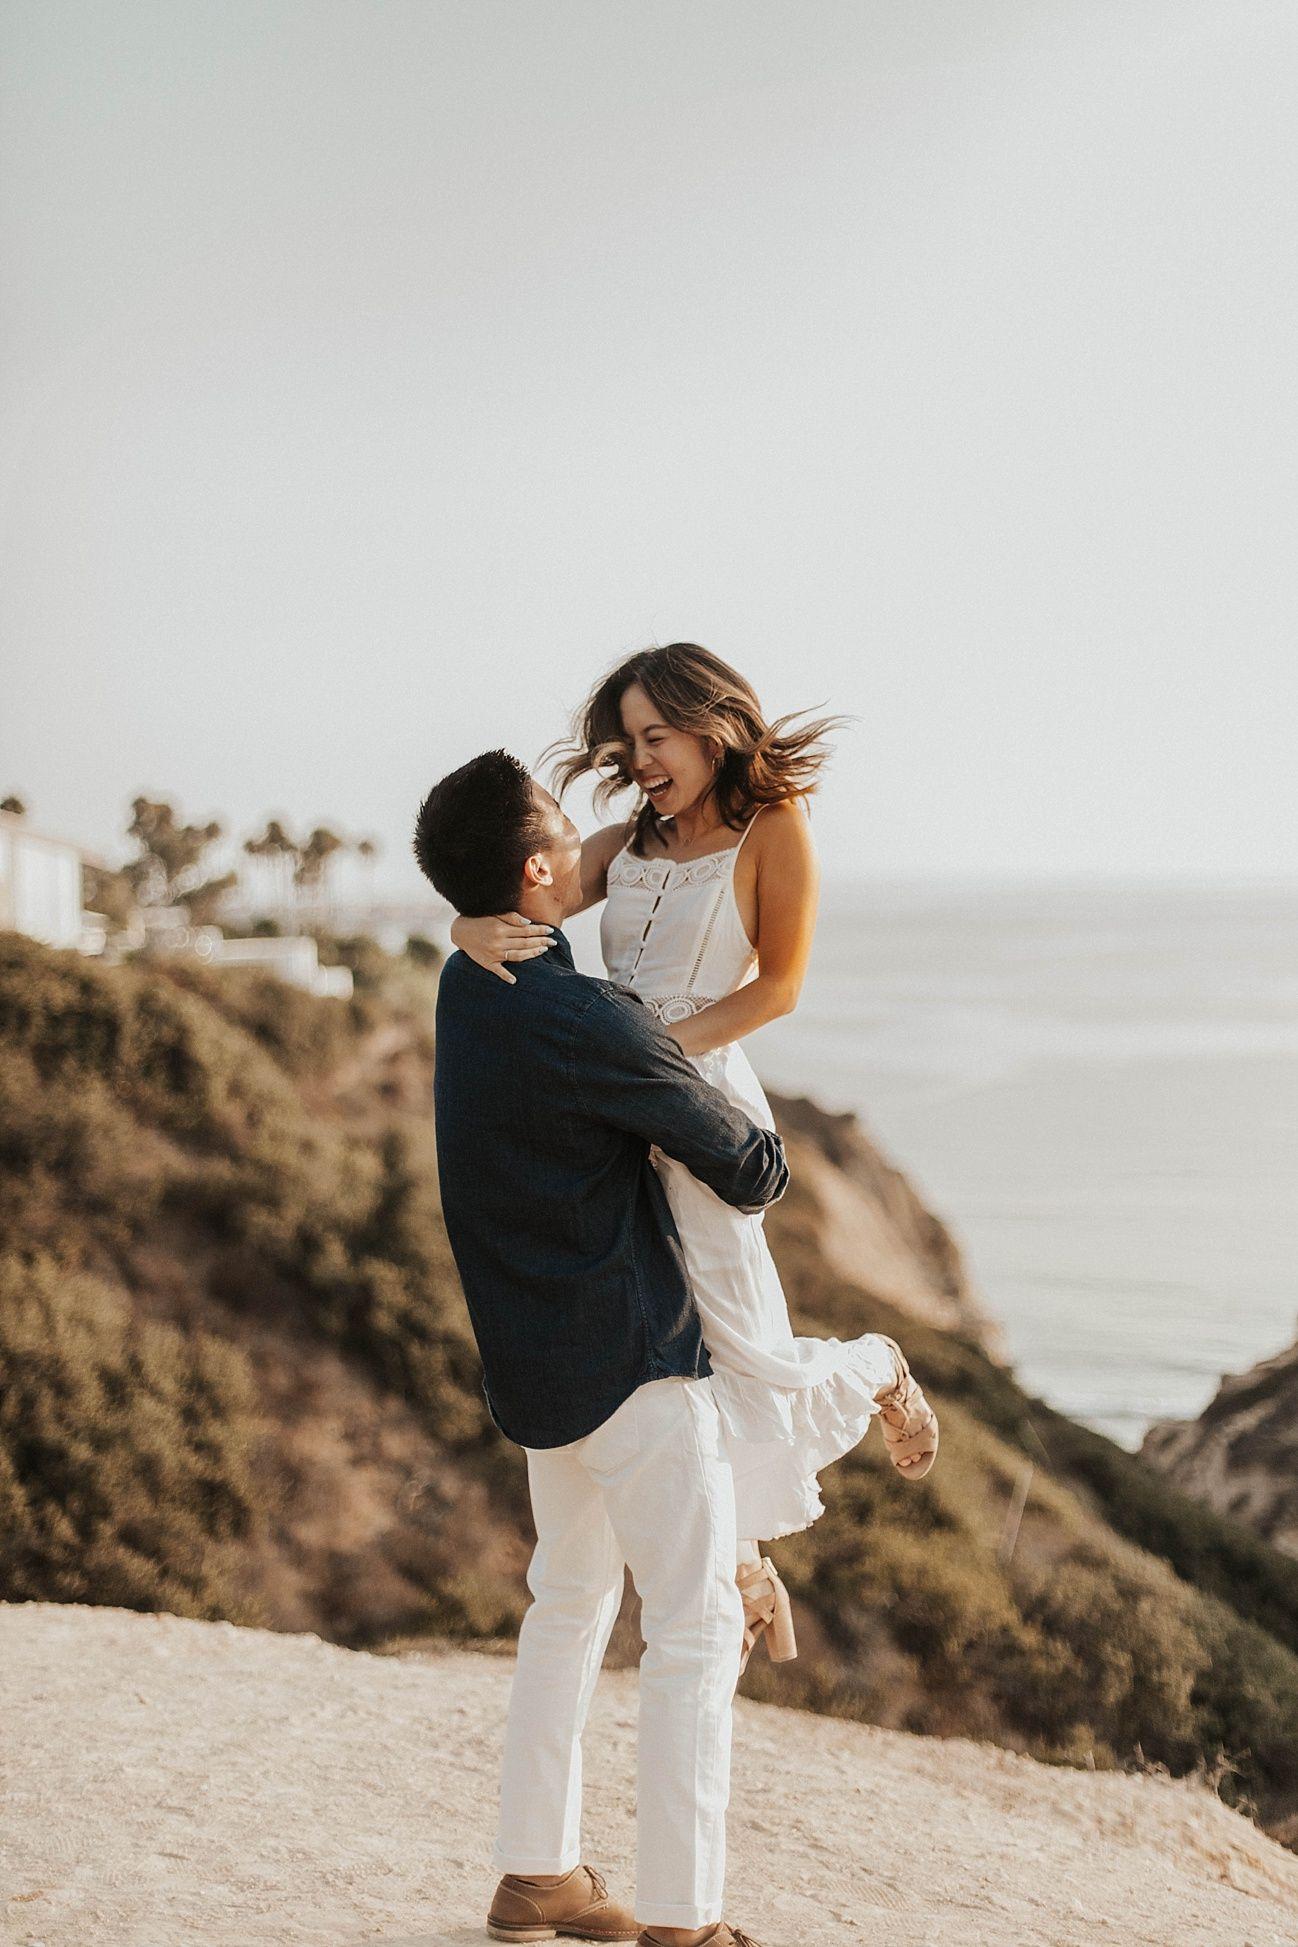 Beach wedding pre shoot  la jolla trails engagement la jolla photography la jolla couple